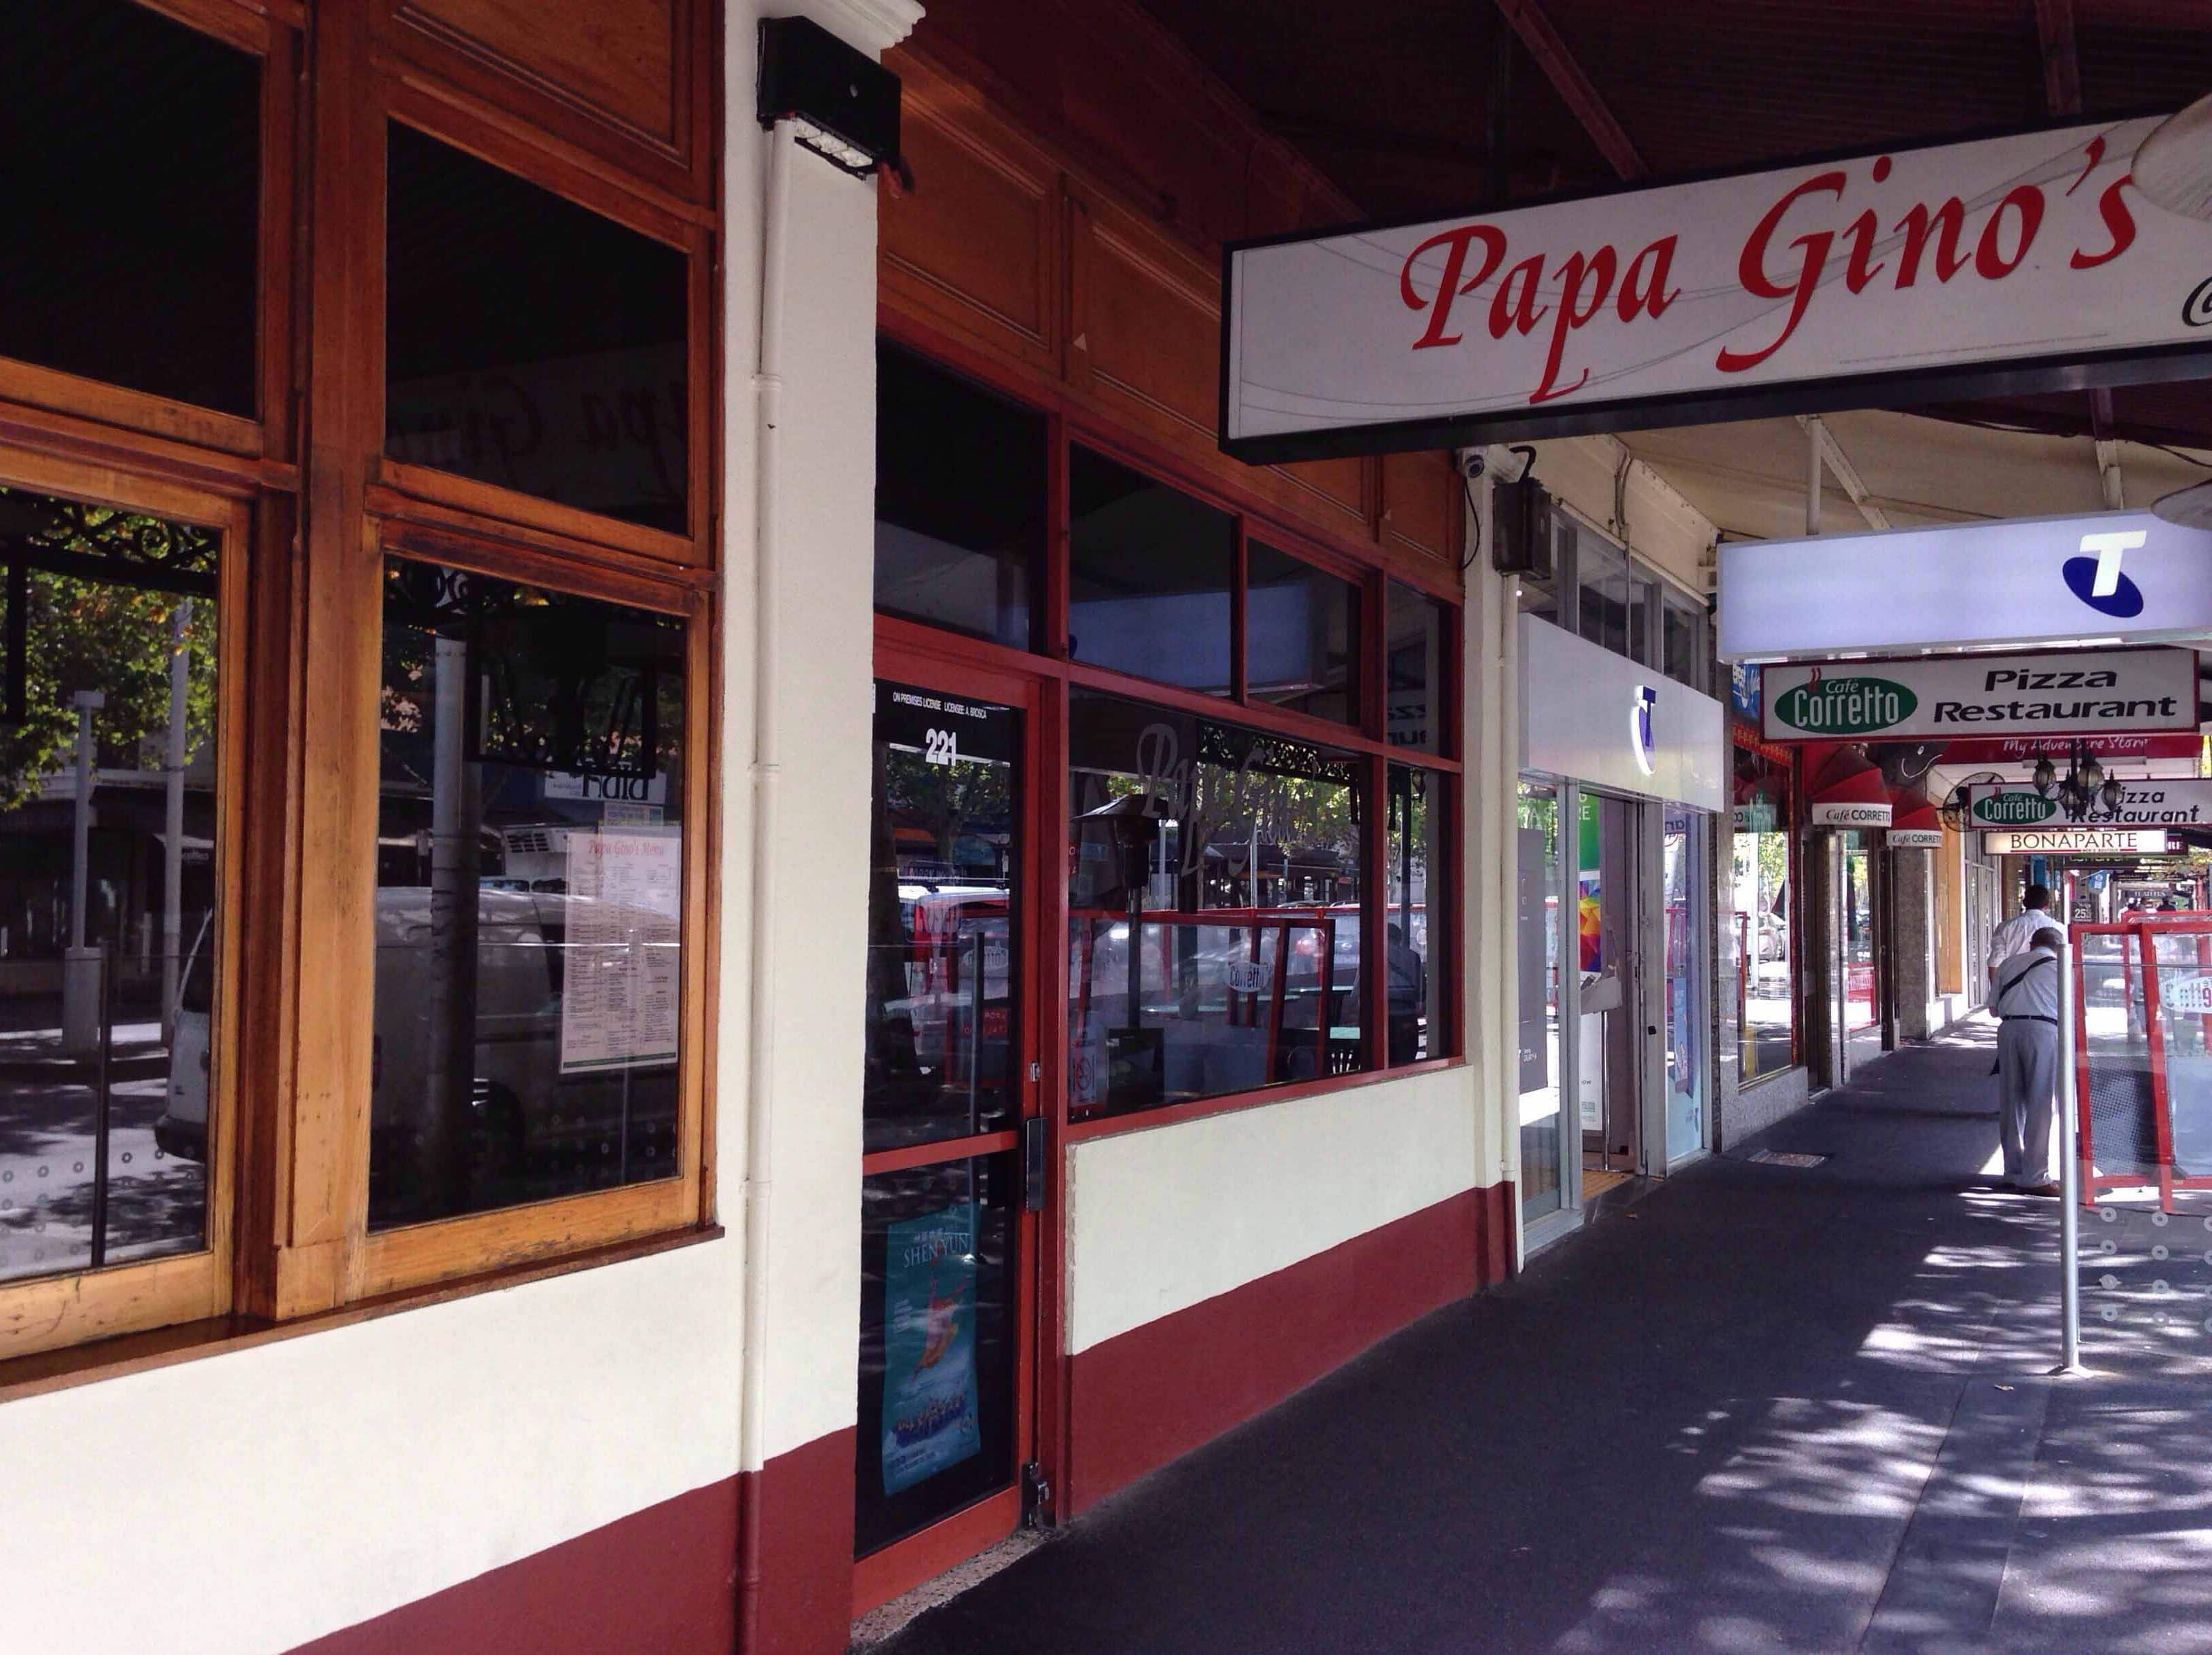 Papa Gino S Carlton Melbourne Return to papa gino's page. papa gino s carlton melbourne